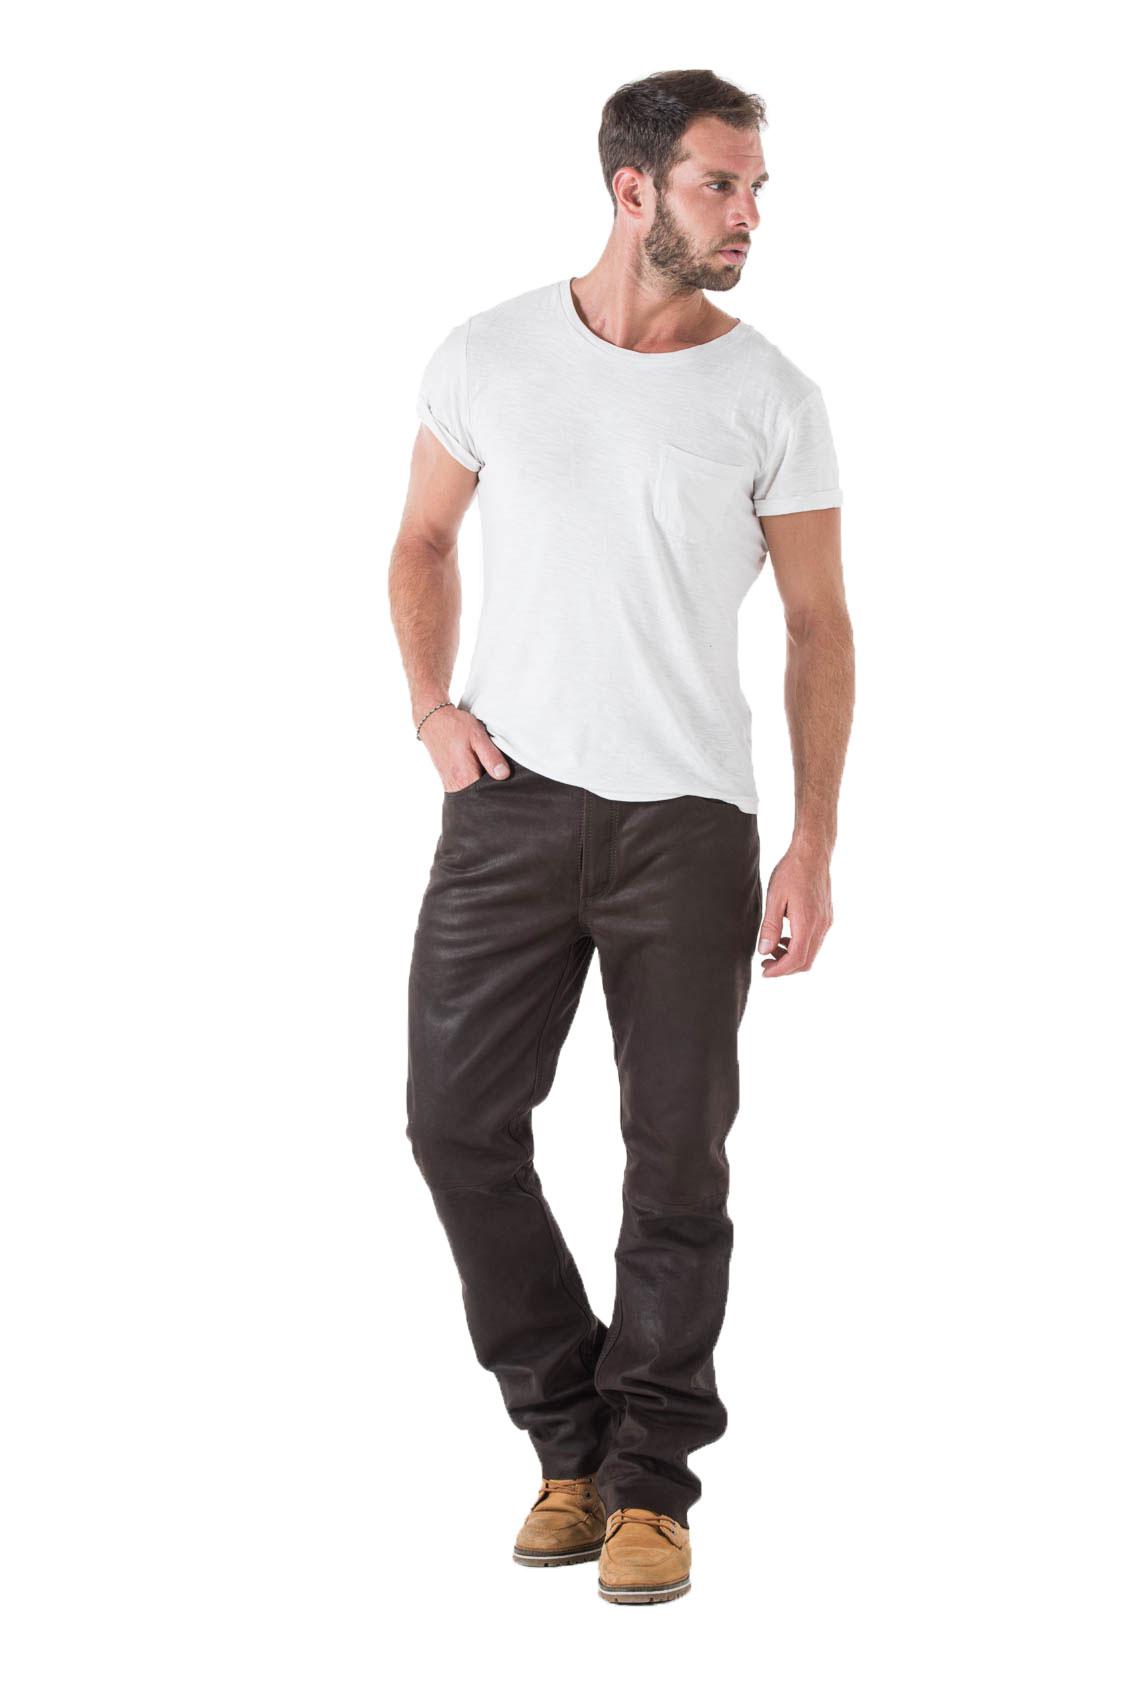 9d7c9e06dca Pantalons cuir CUIRS GUIGNARD en cuir vachette-ref TROUSER marron ...